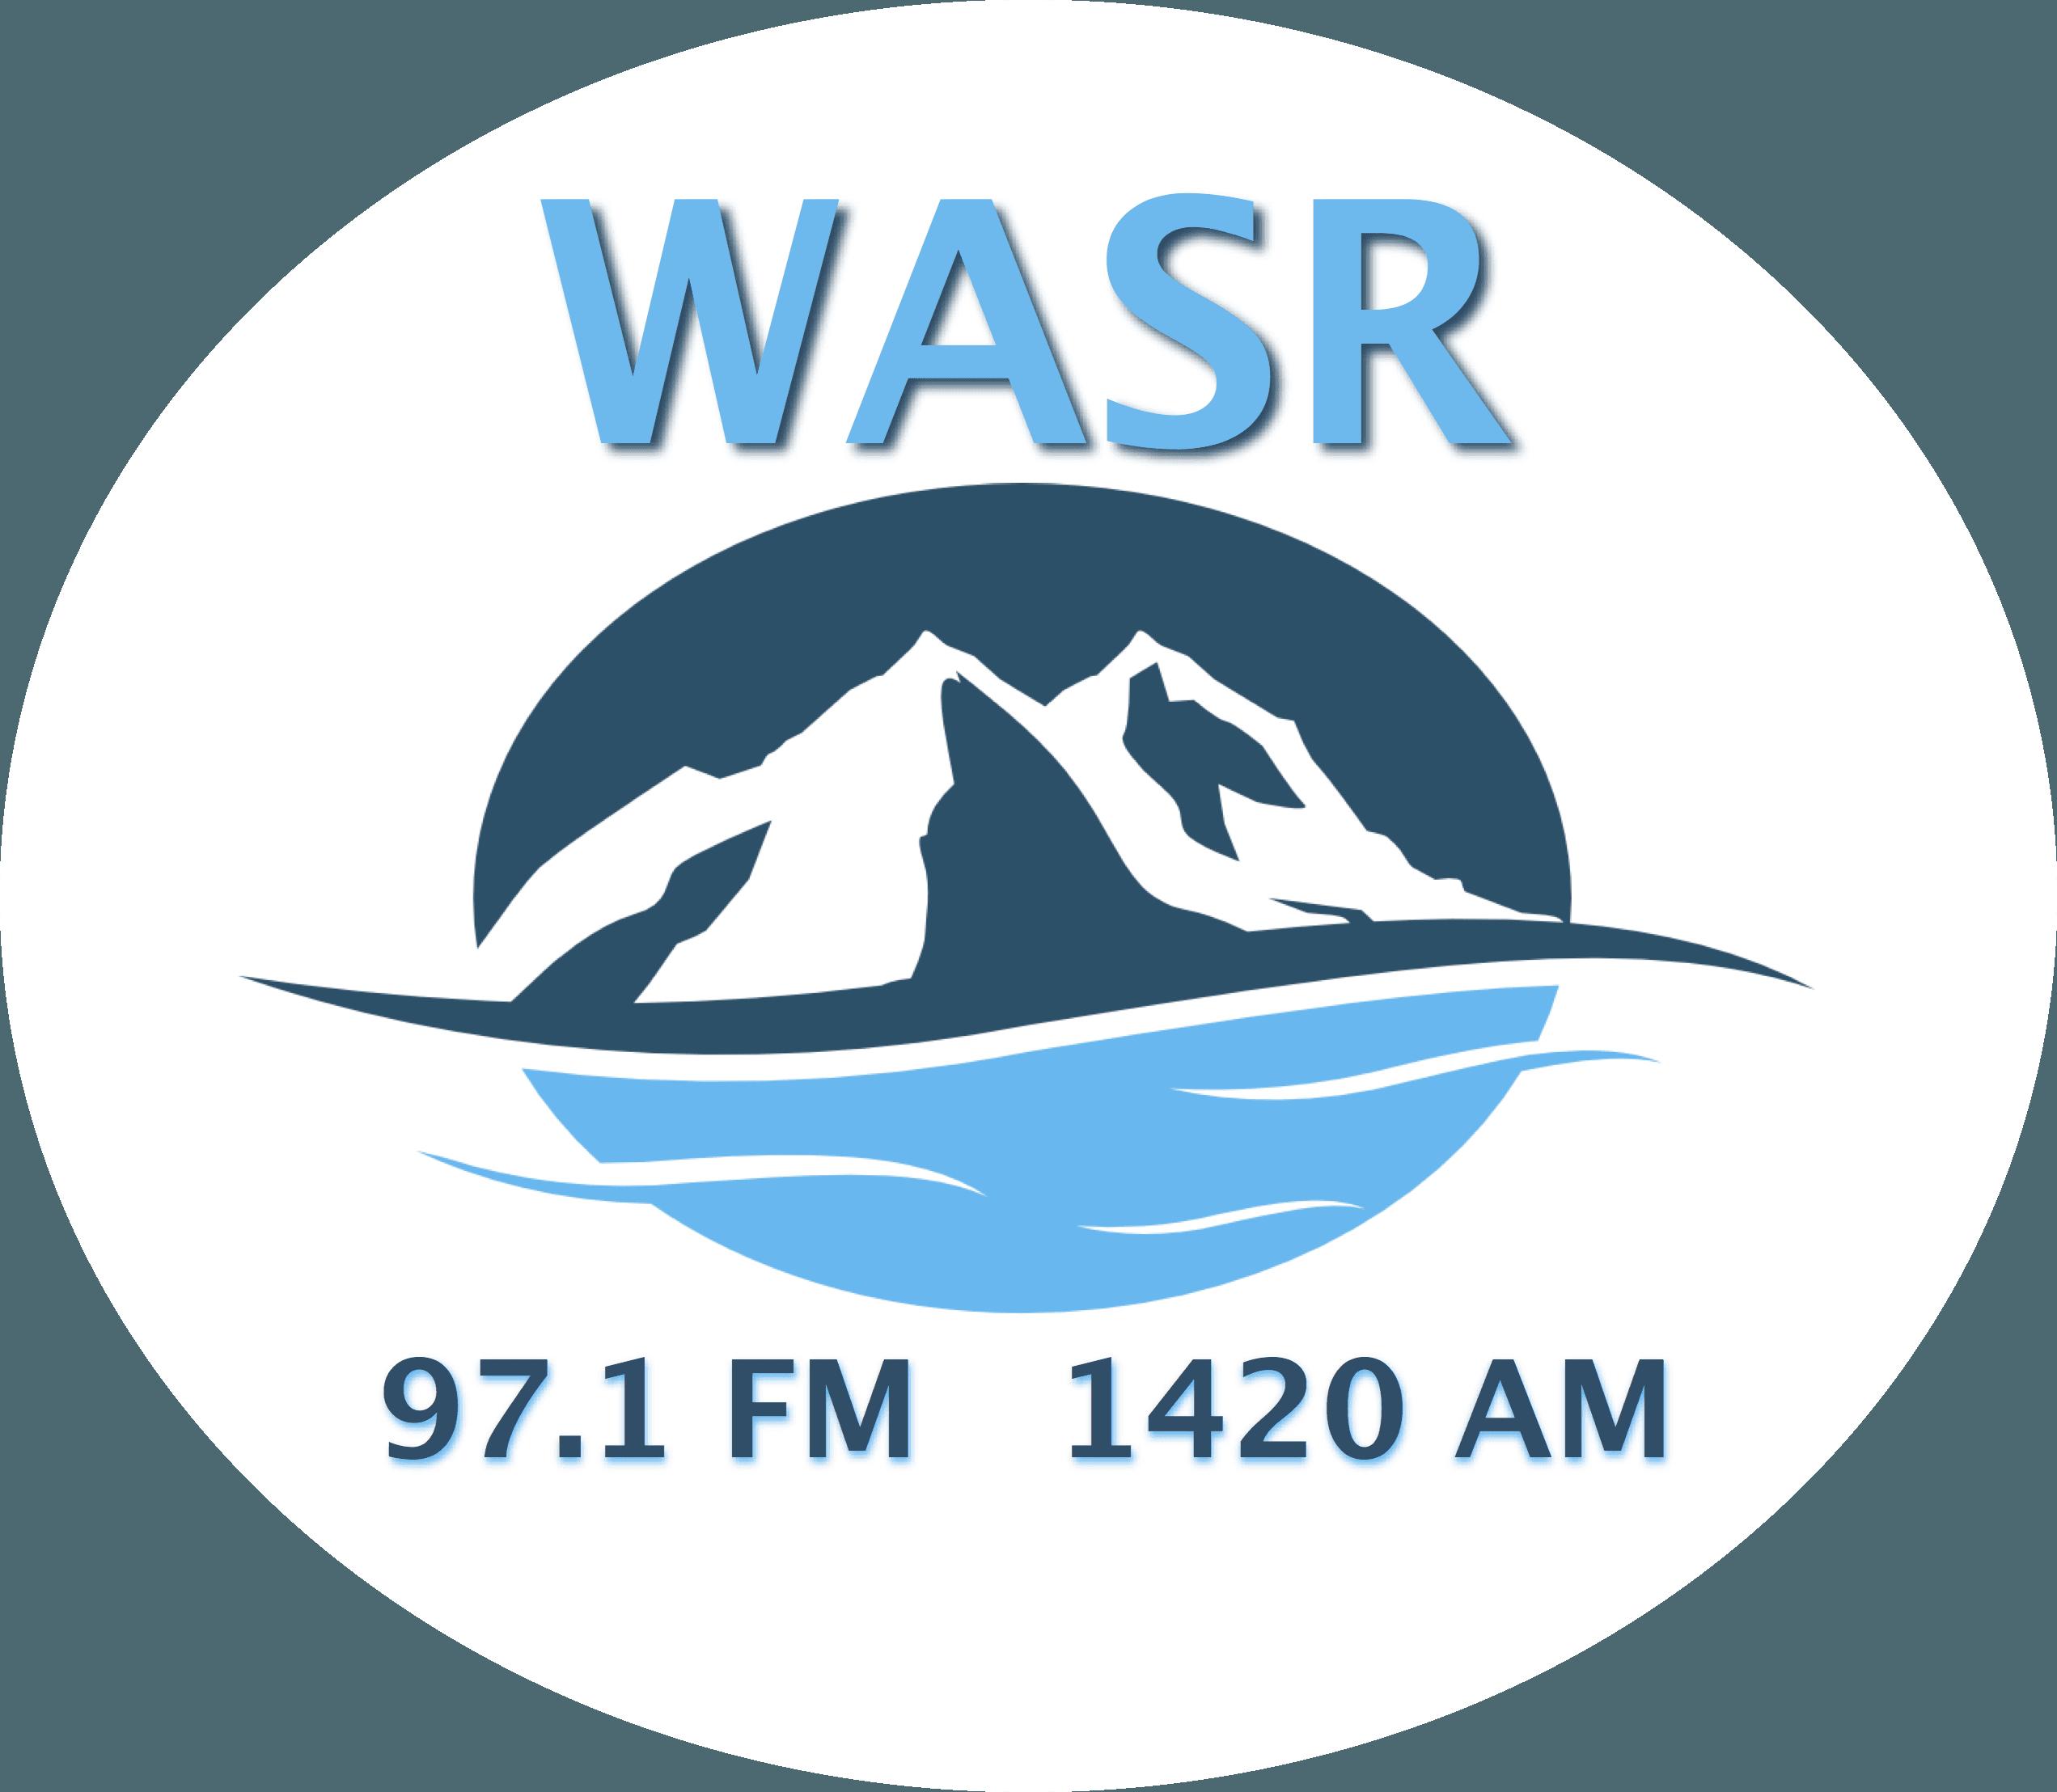 WASR 97.1FM 1420AM - Local Talk, and News Wolfeboro NH